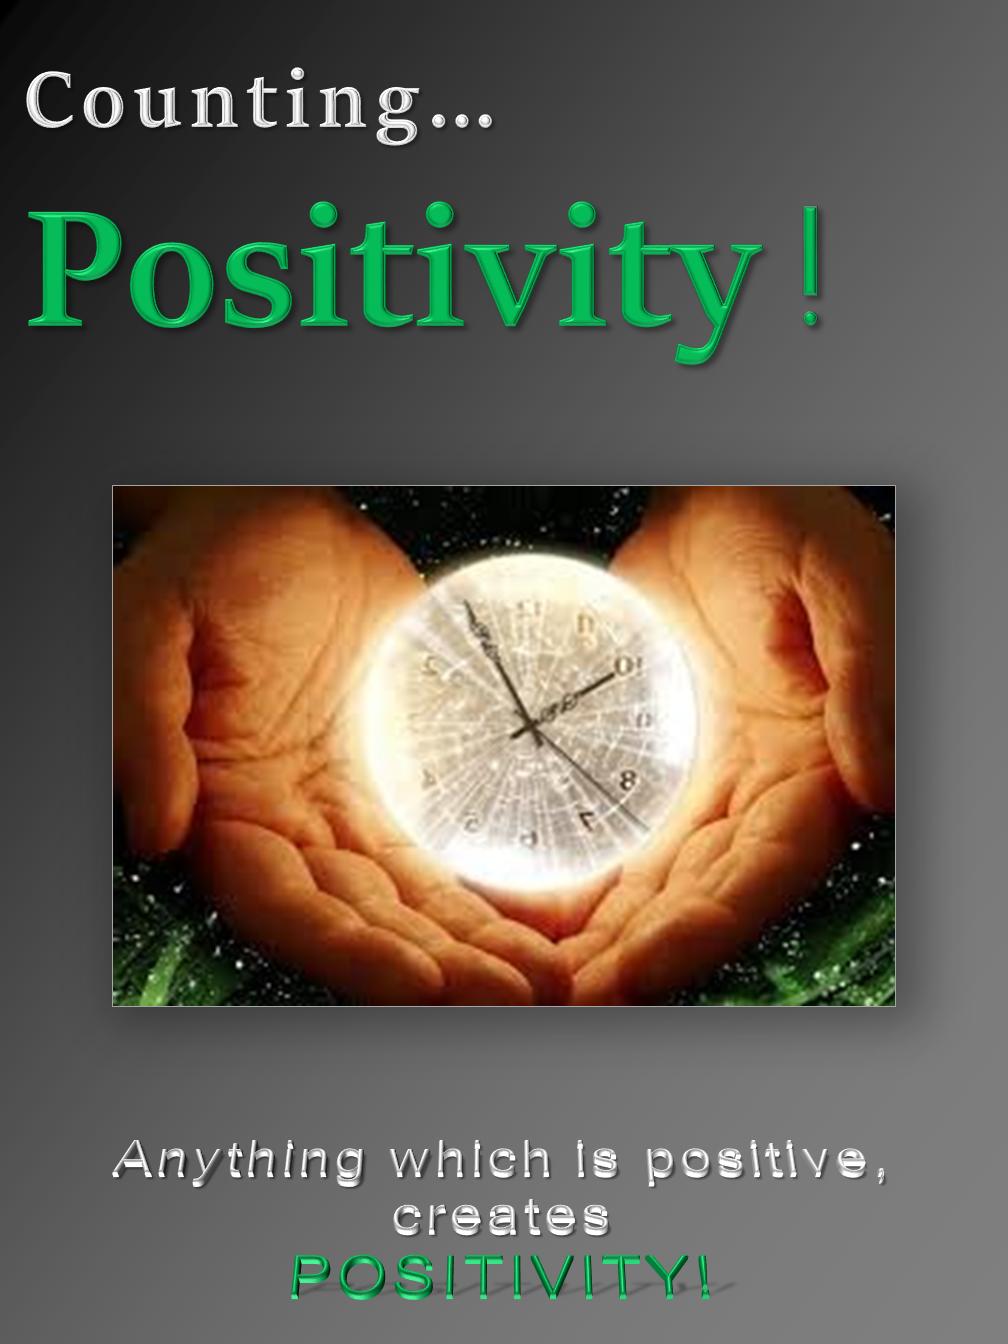 Positivity !